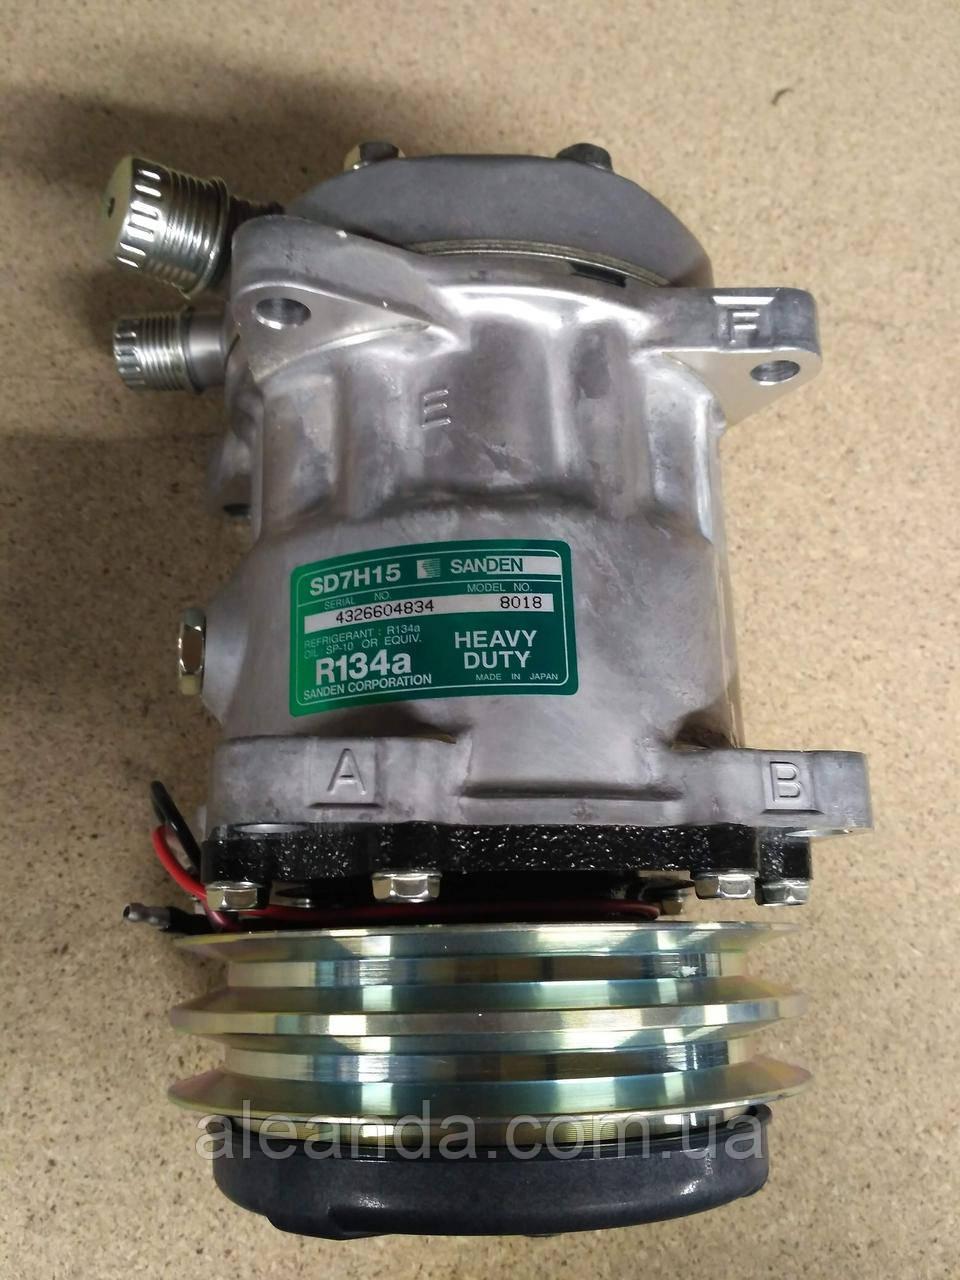 F2520012 F2520013 Hidromek Компрессор кондиционера Sanden SD7H15 8018